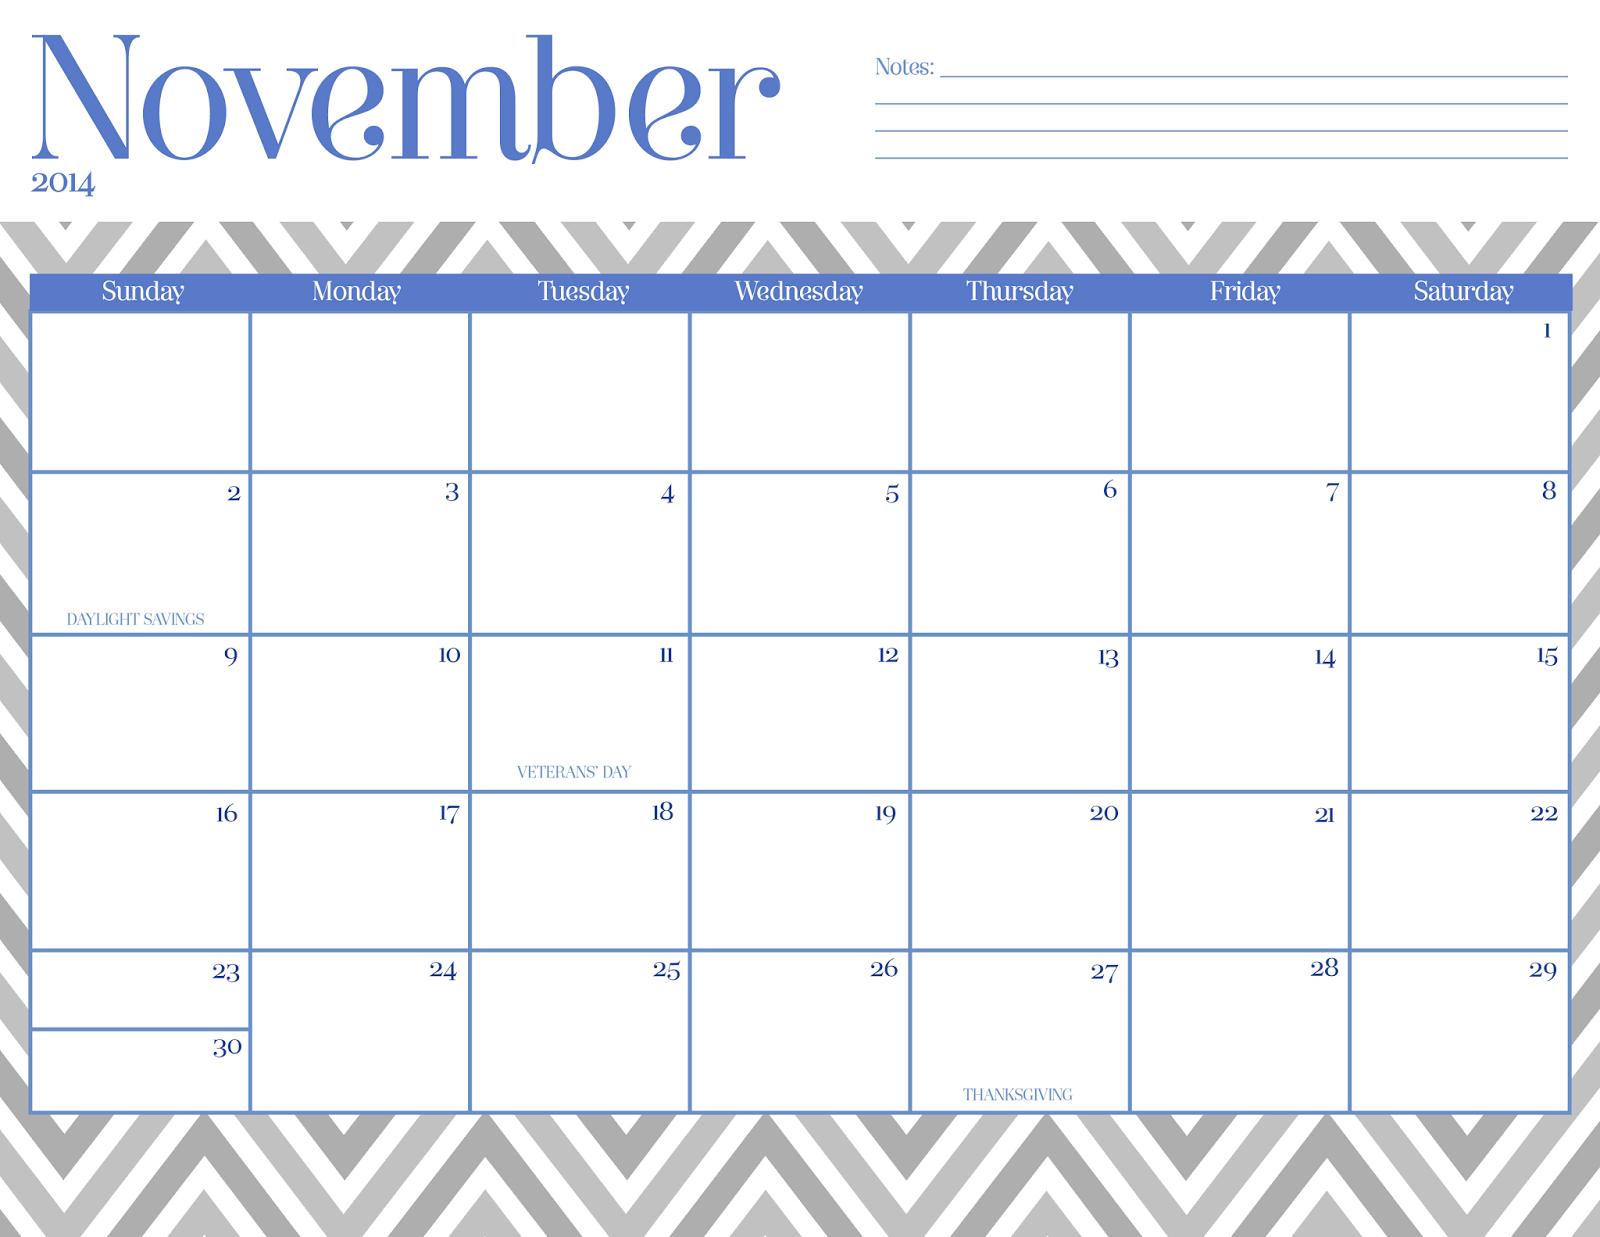 2015 Calendar November 2015 Printable One Page | Calendar Template ...